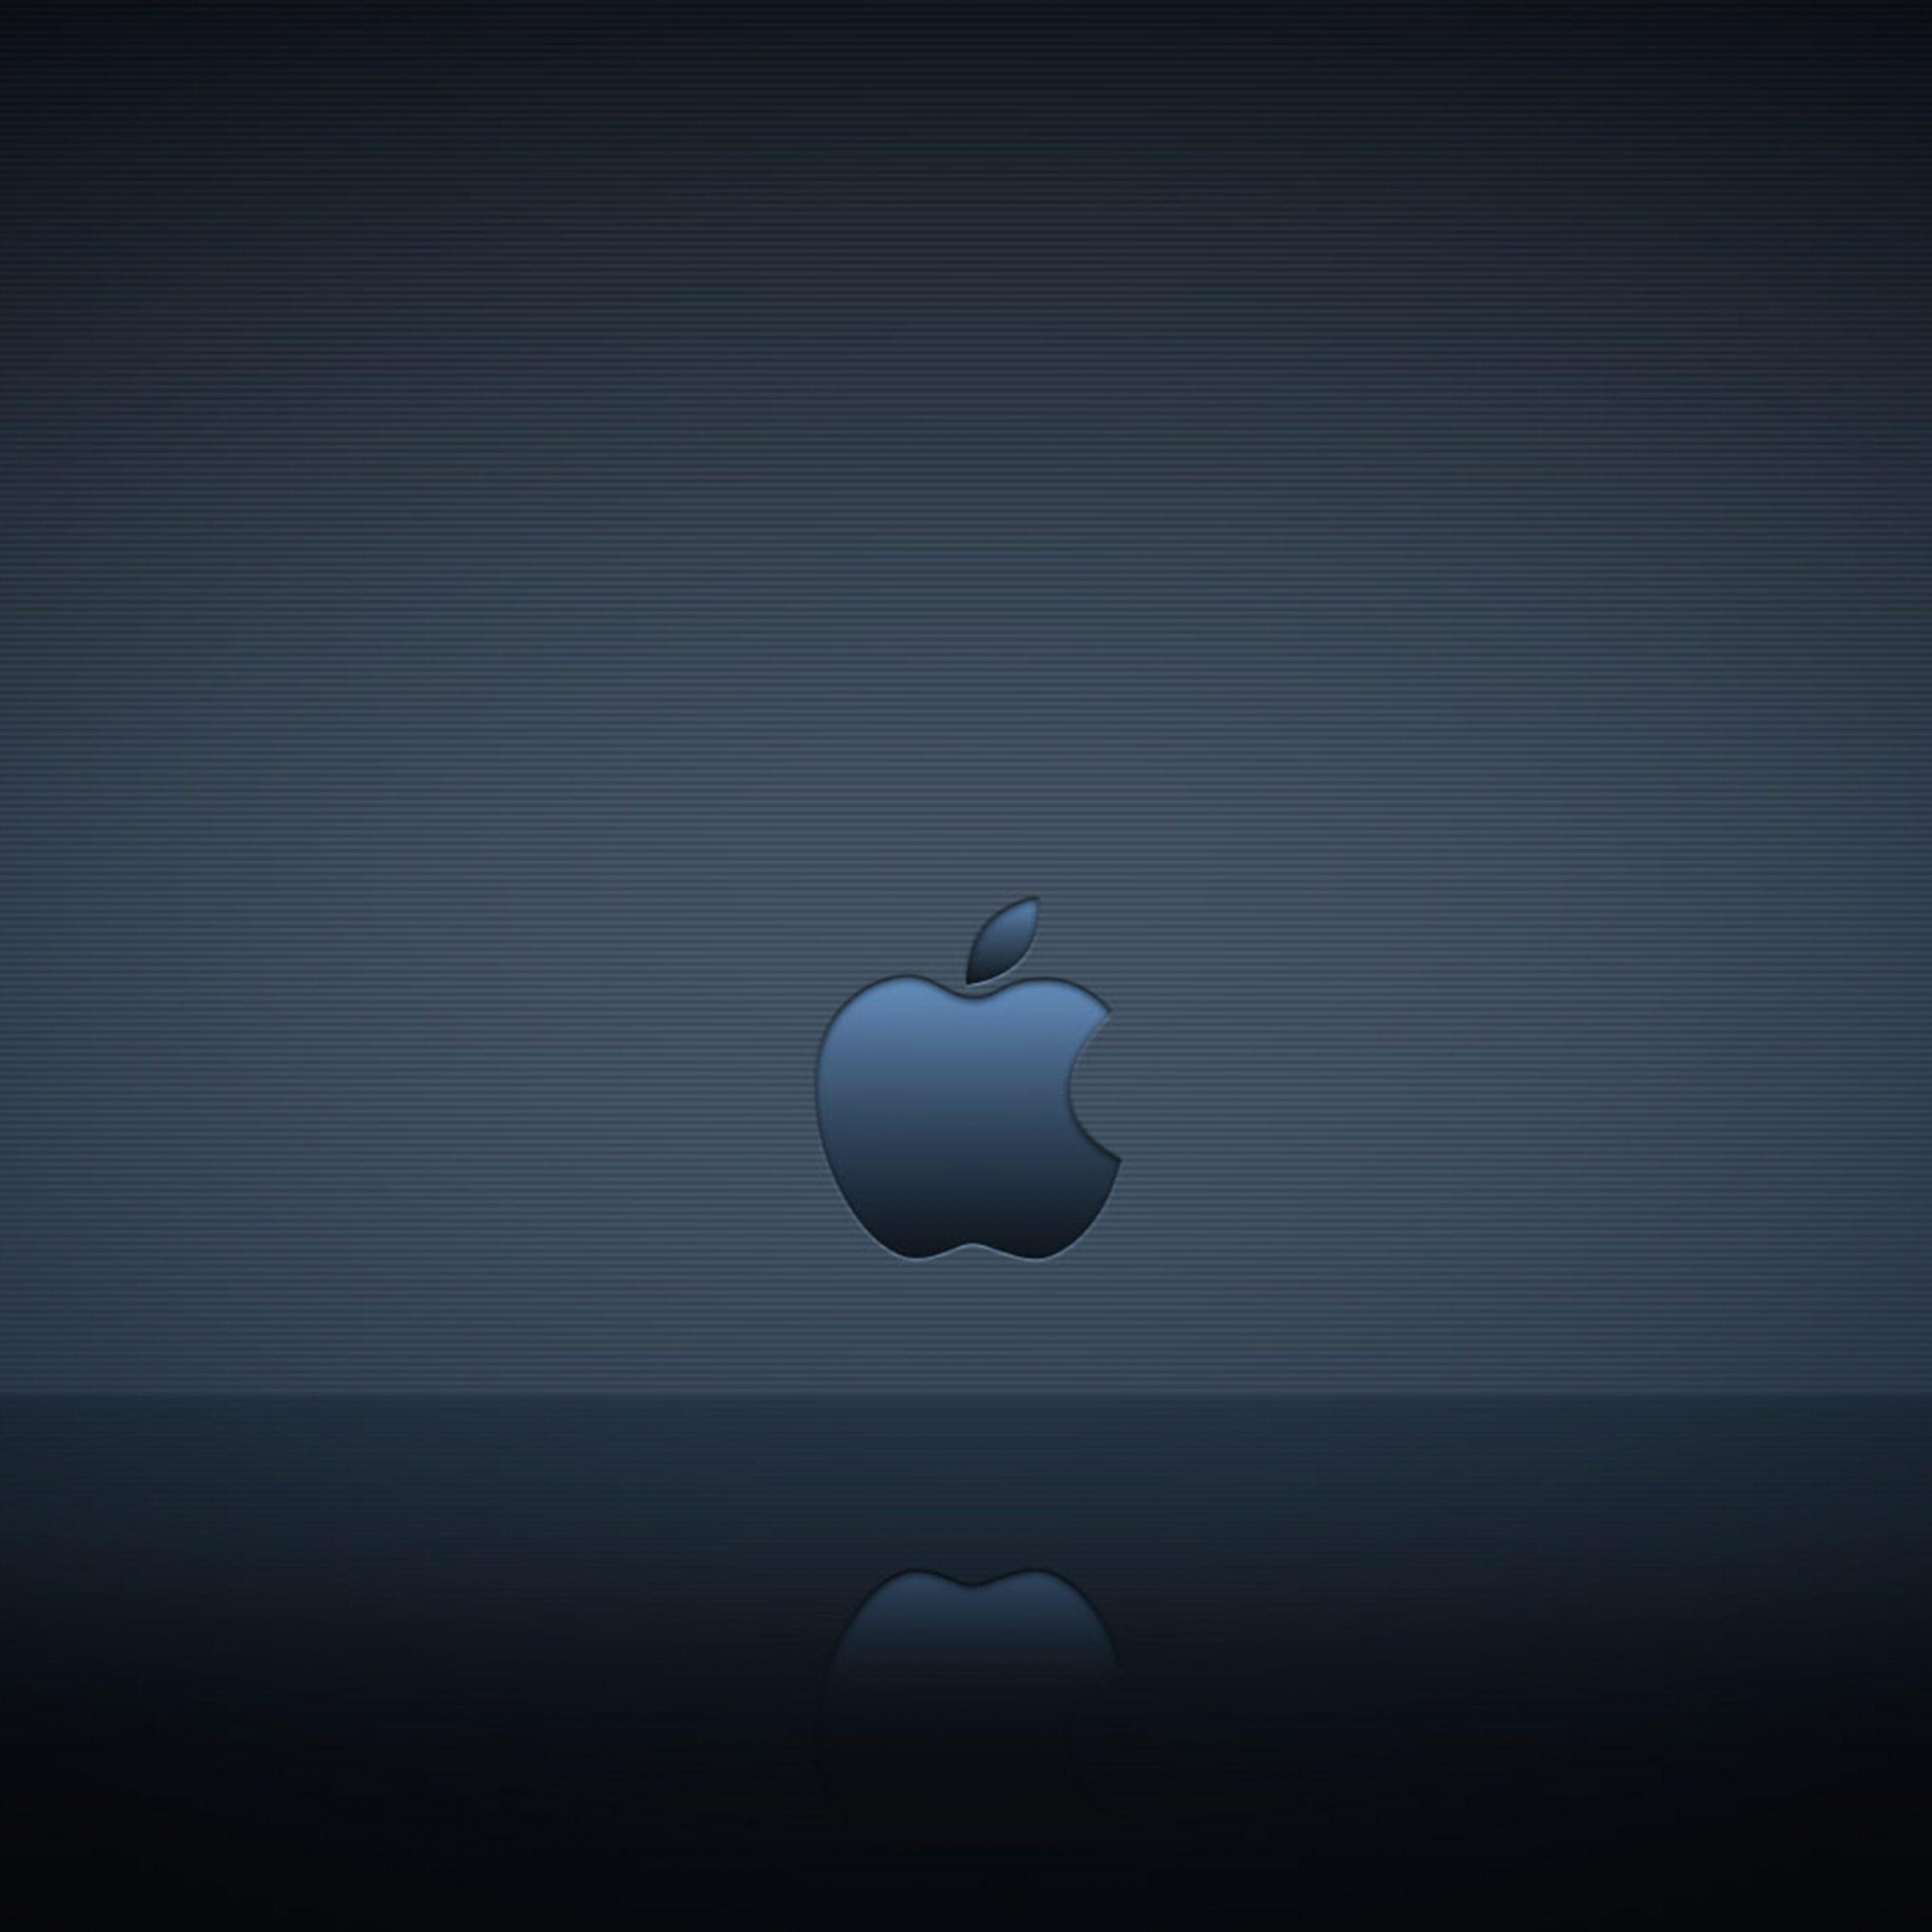 2732x2732 wallpapers 4k iPad Pro Apple Logo Reflection Ipad Wallpaper 2732x2732 pixels resolution